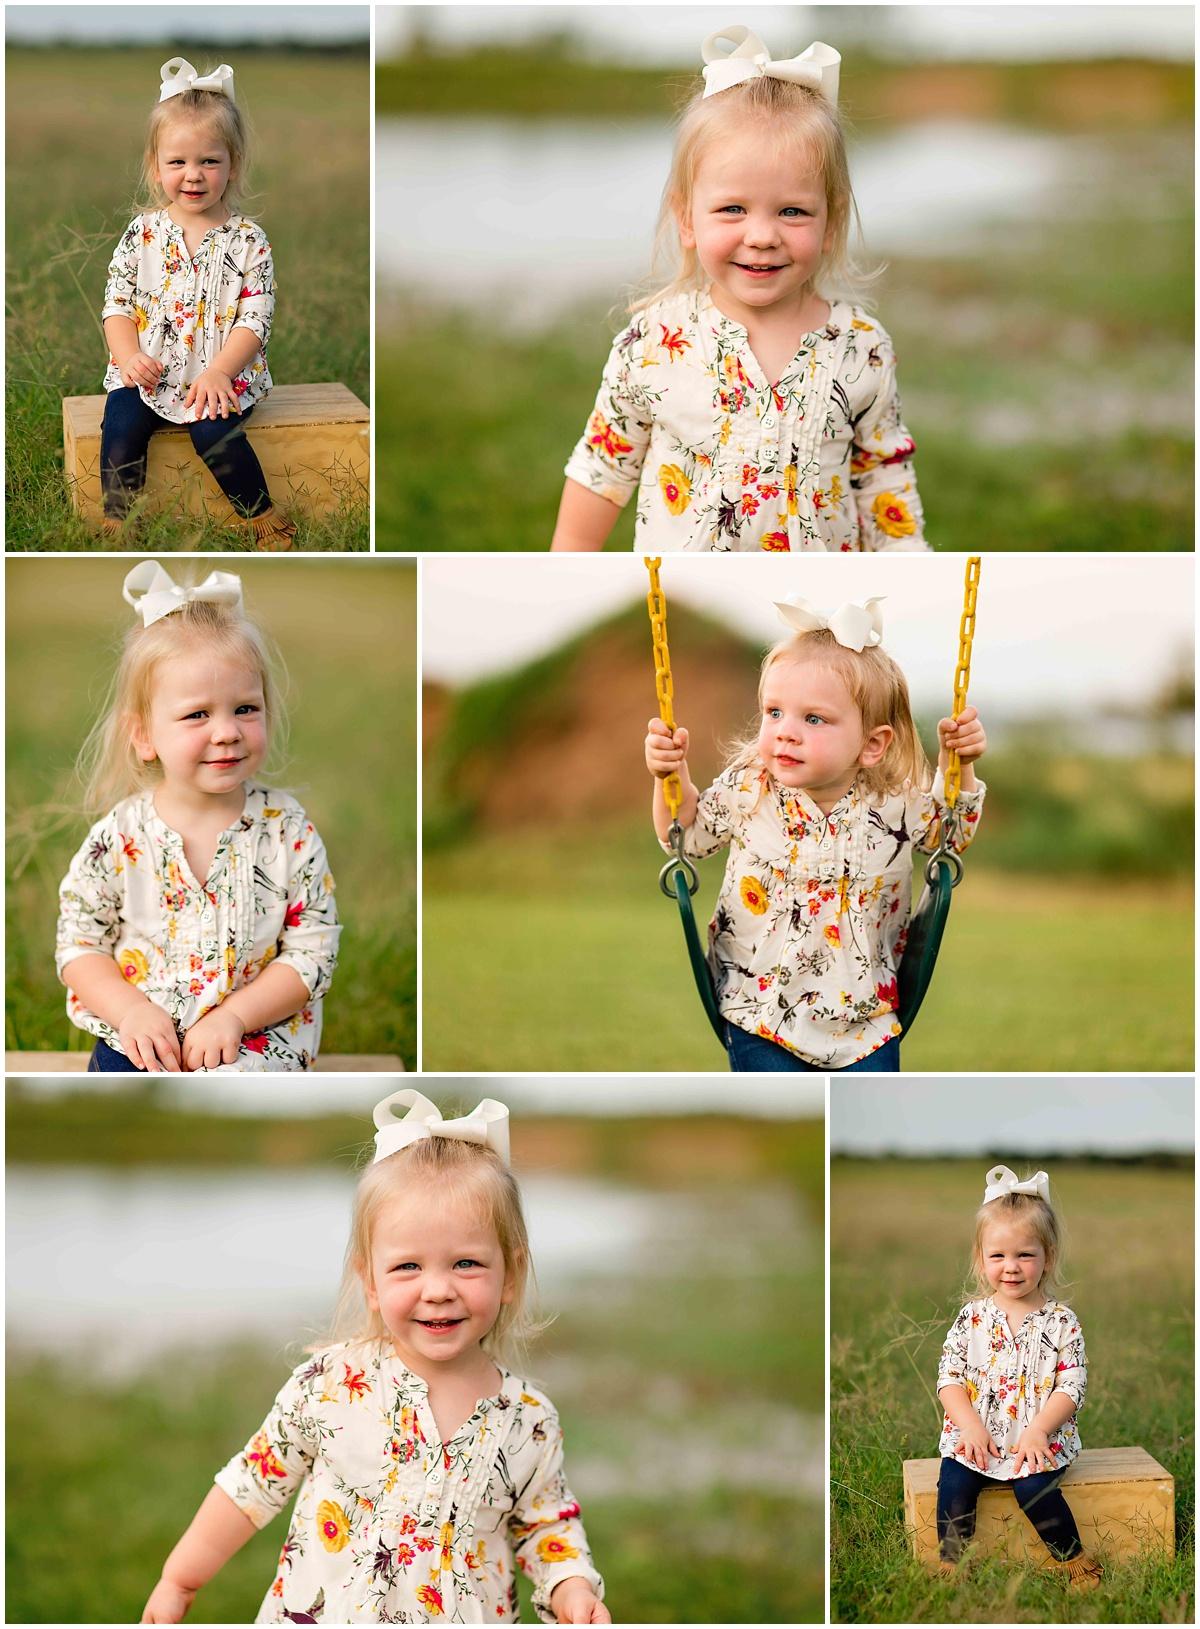 Family-Children-Maternity-Portraits-San-Antonio-Hill-Country-Texas-Carly-Barton-Photography_0027.jpg